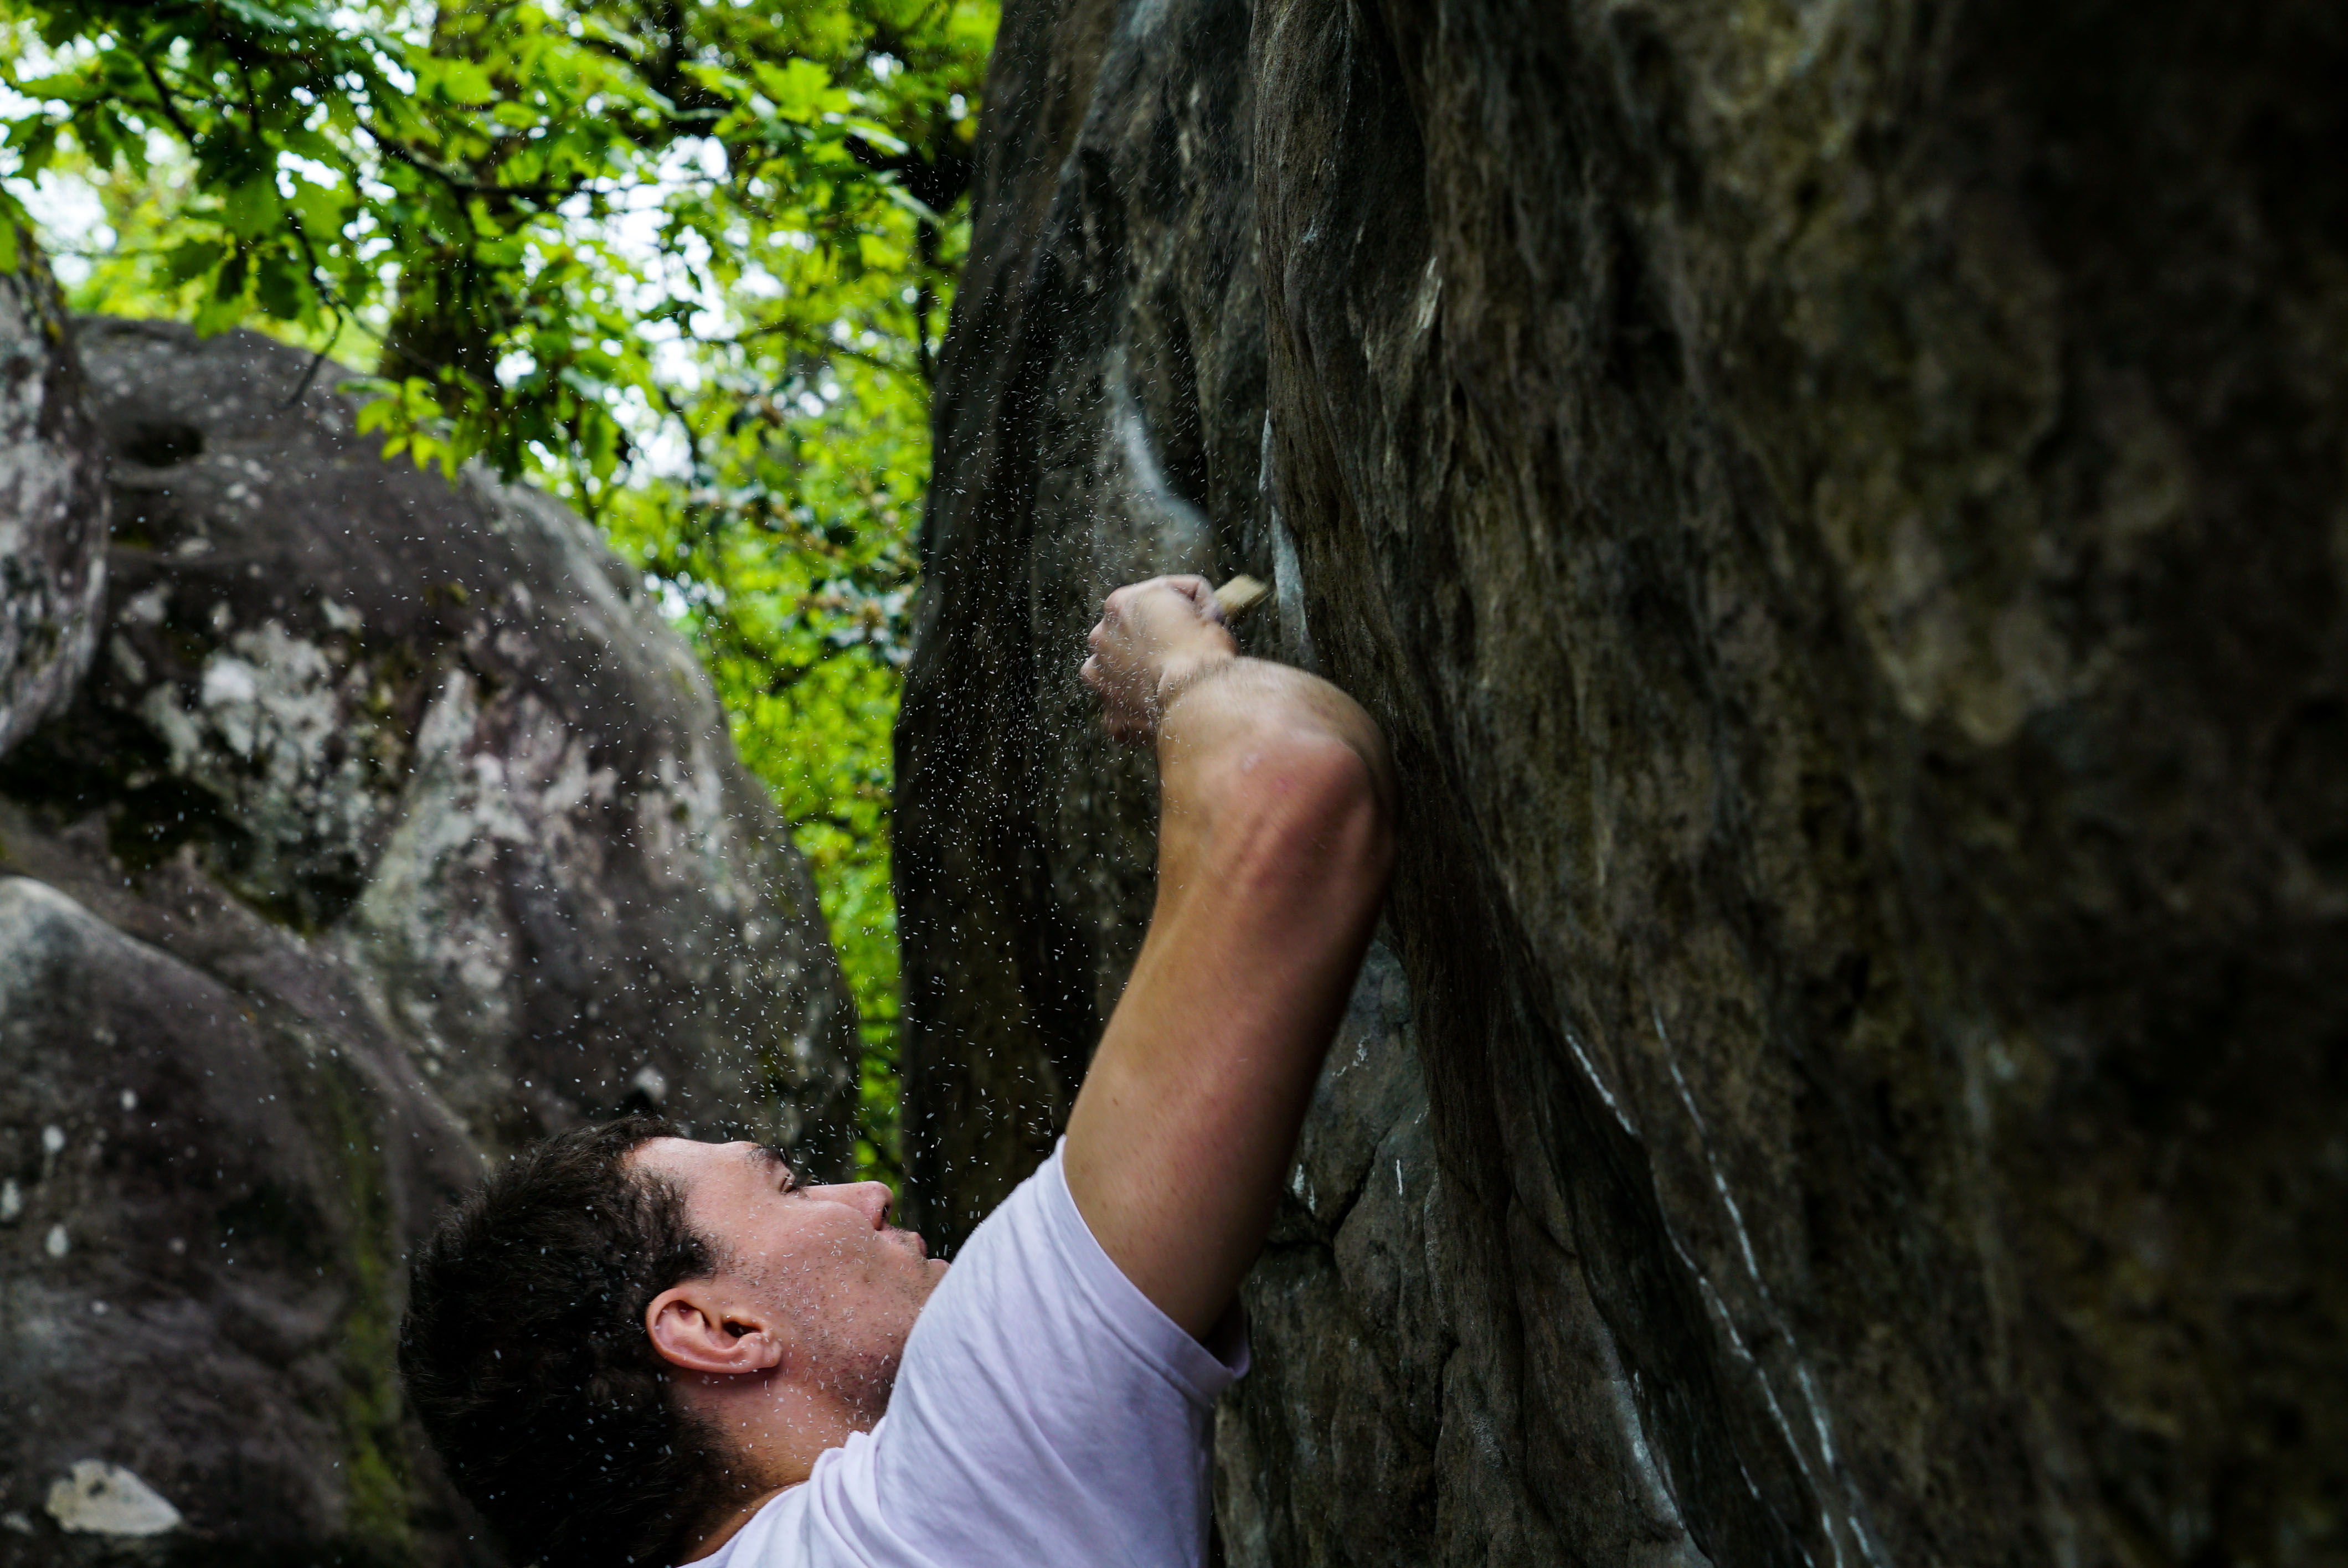 fontainbleau climbing 2016 mike brindley-39